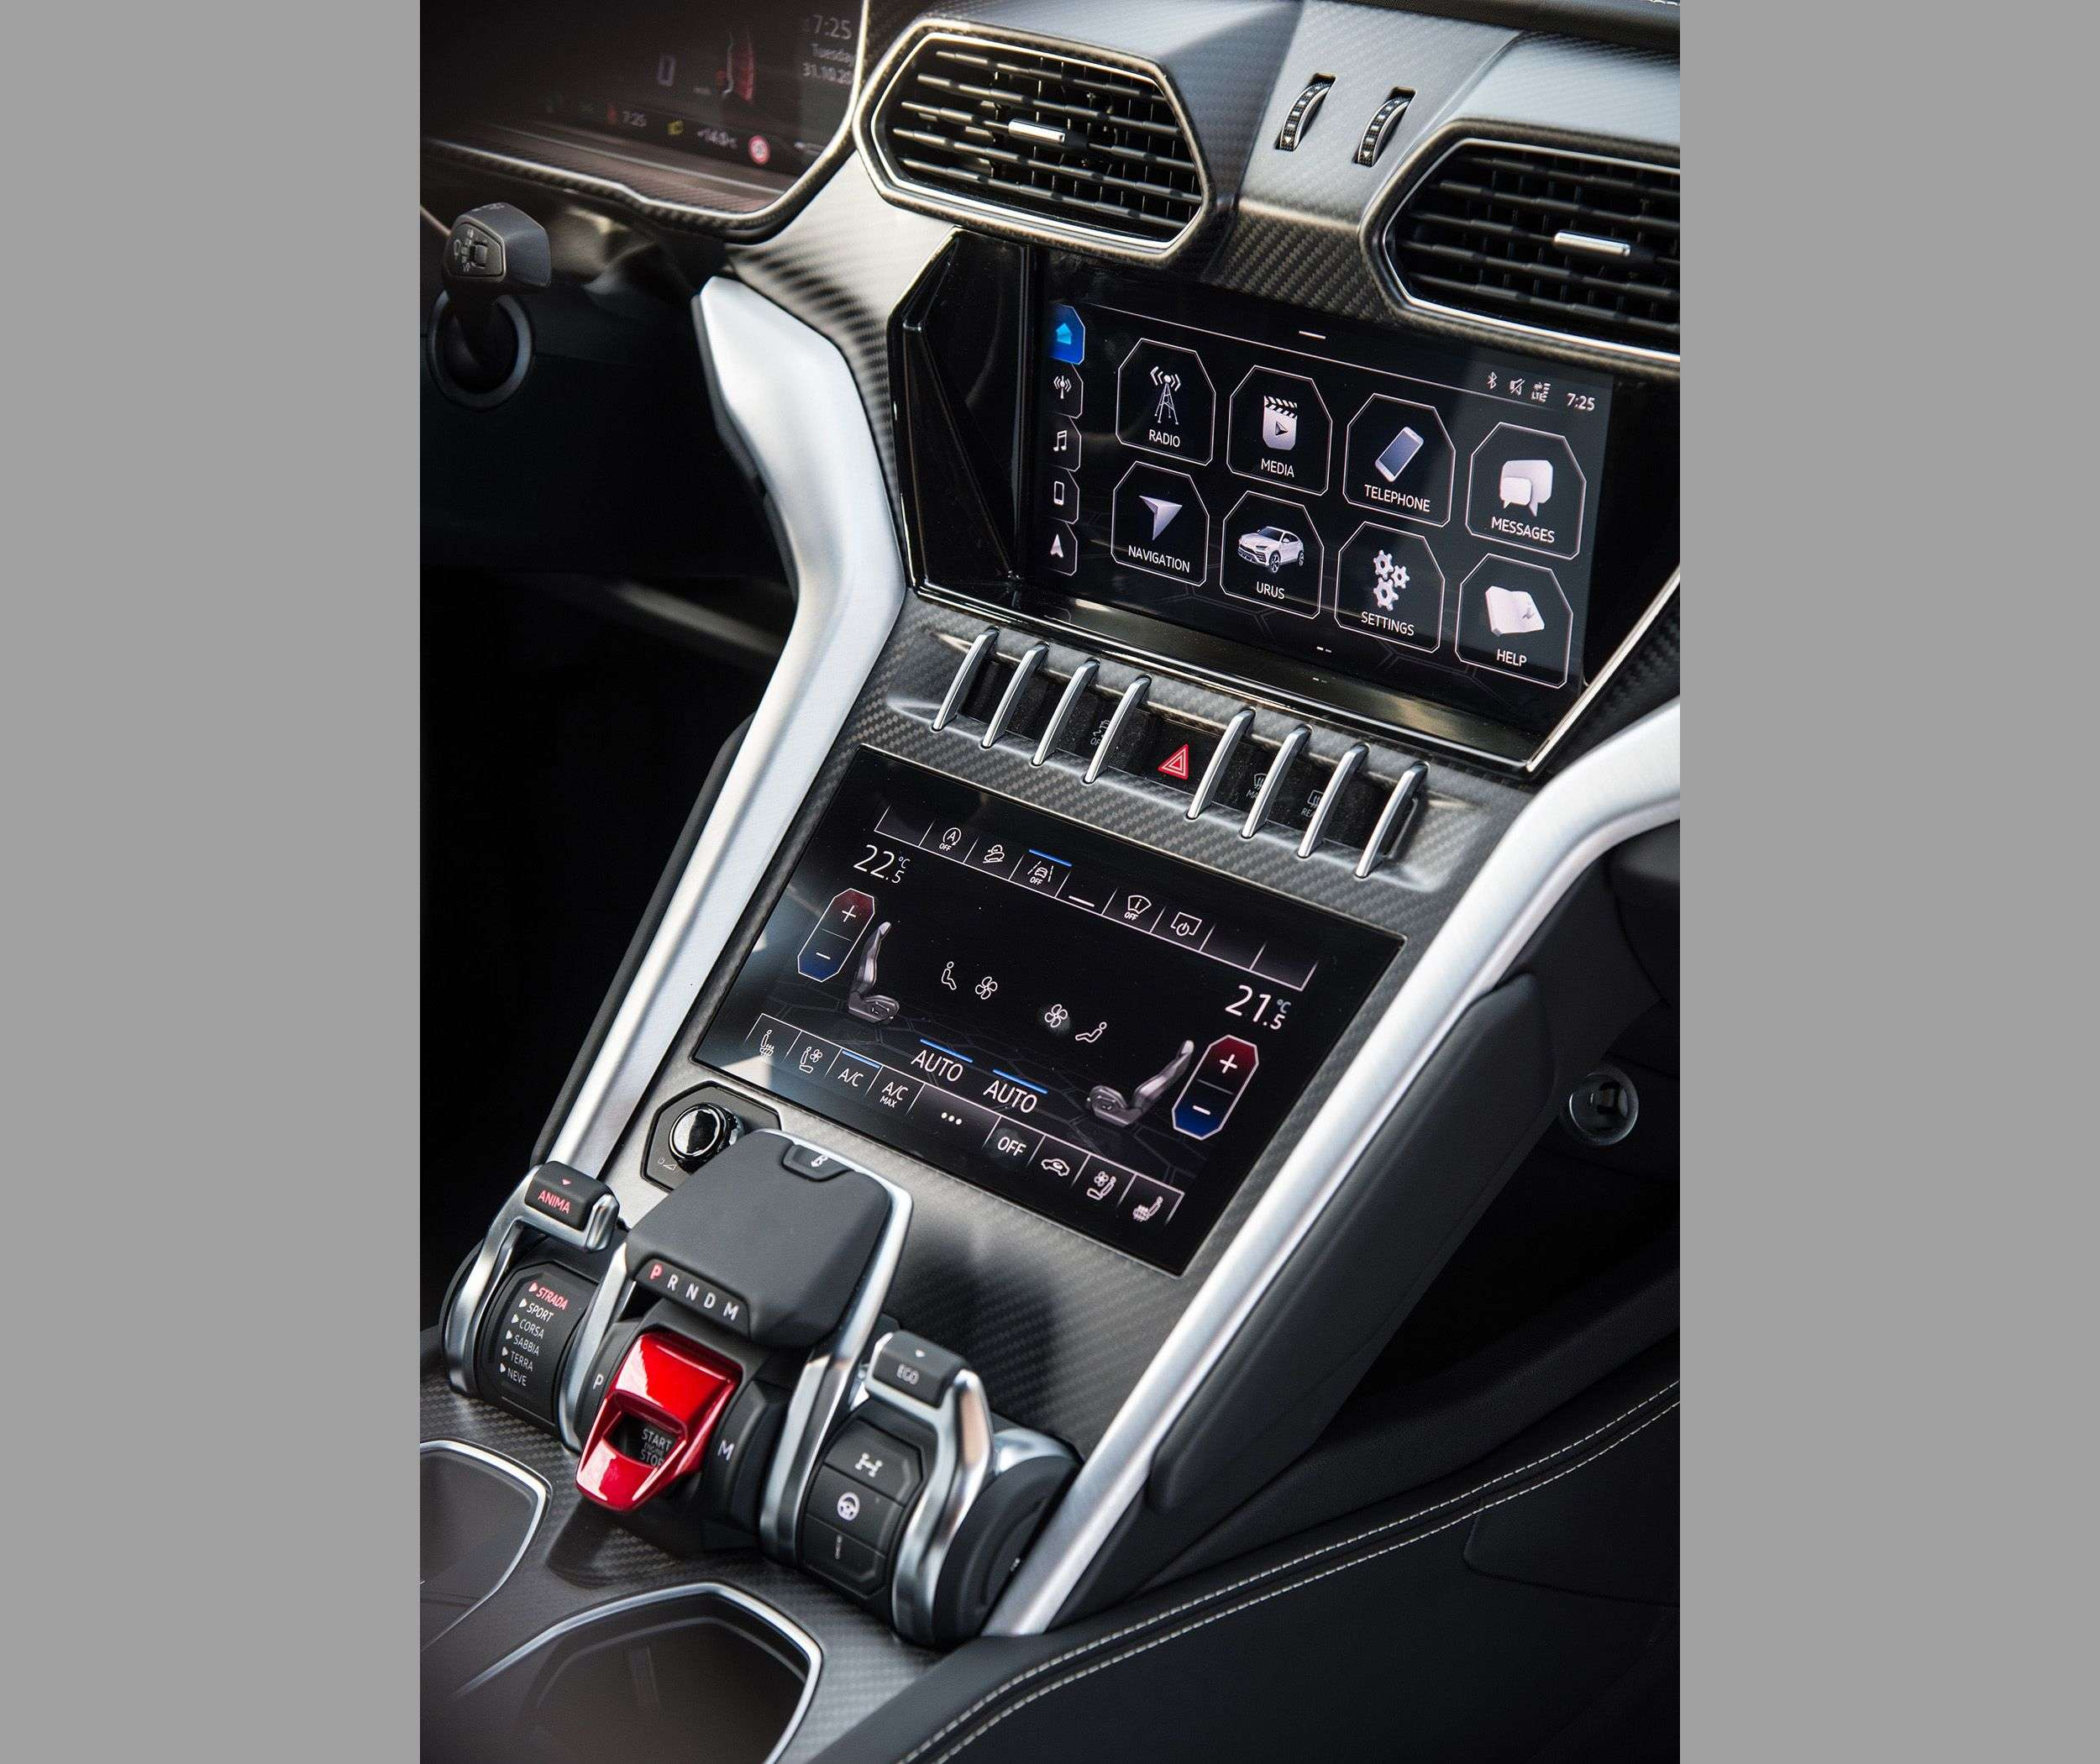 1512663213 panel klimat kontrolya i multimediynoy sistemy - Обзор кроссовера Lamborghini Urus 2019